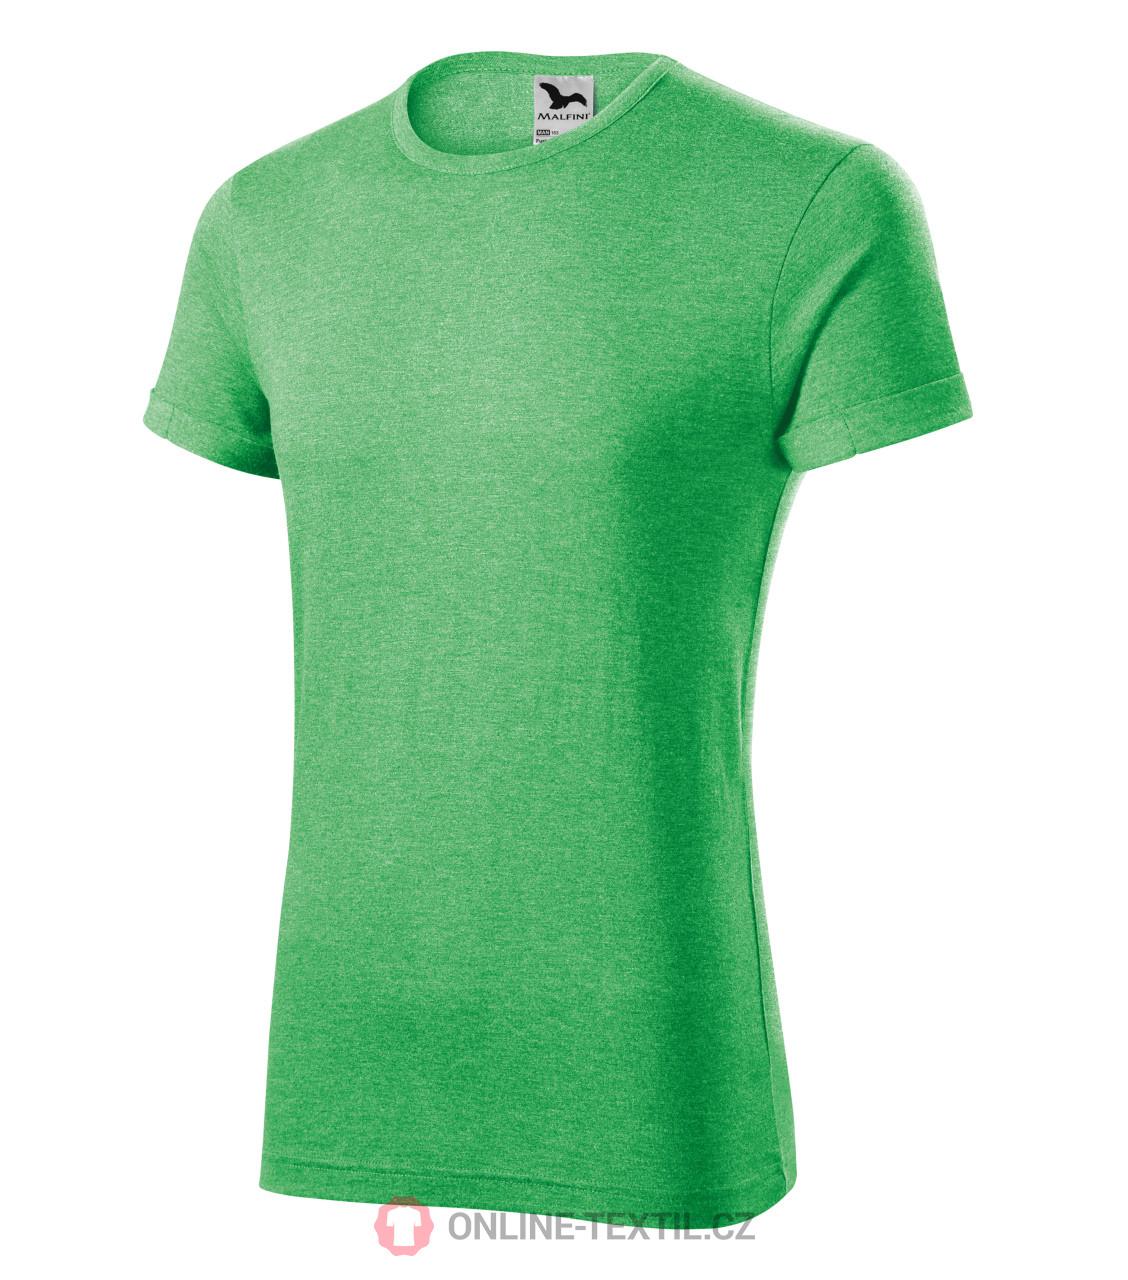 78e9a67f1 ADLER CZECH Melírované pánske tričko Fusion 163 - zelený melír z ...